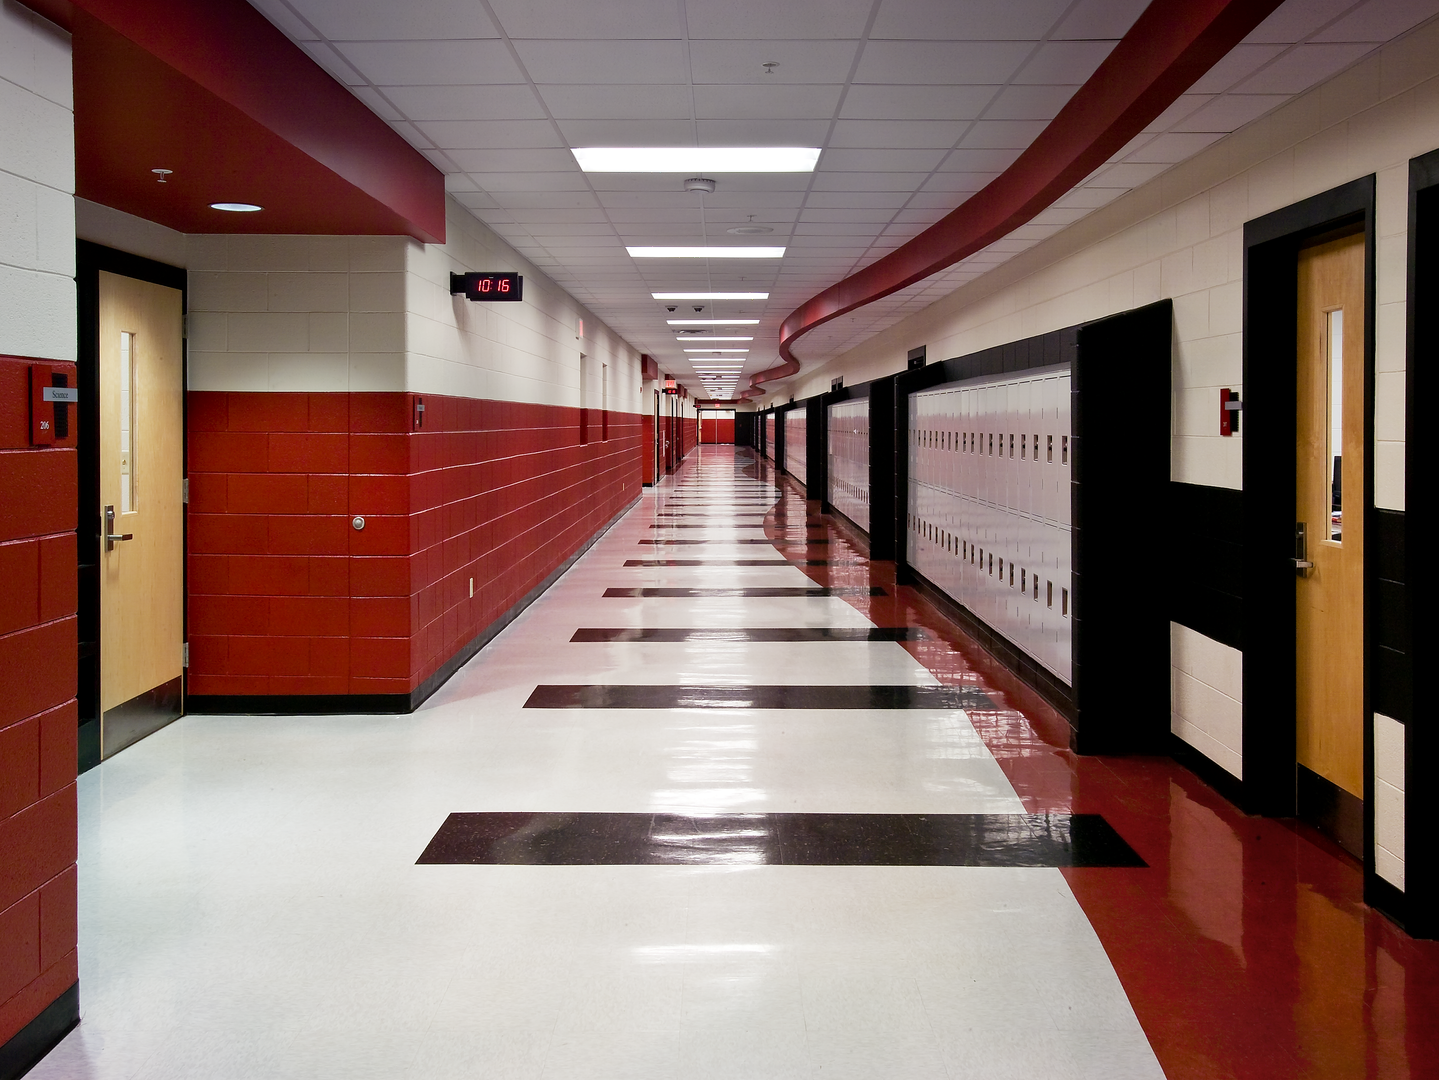 Corridor.tif